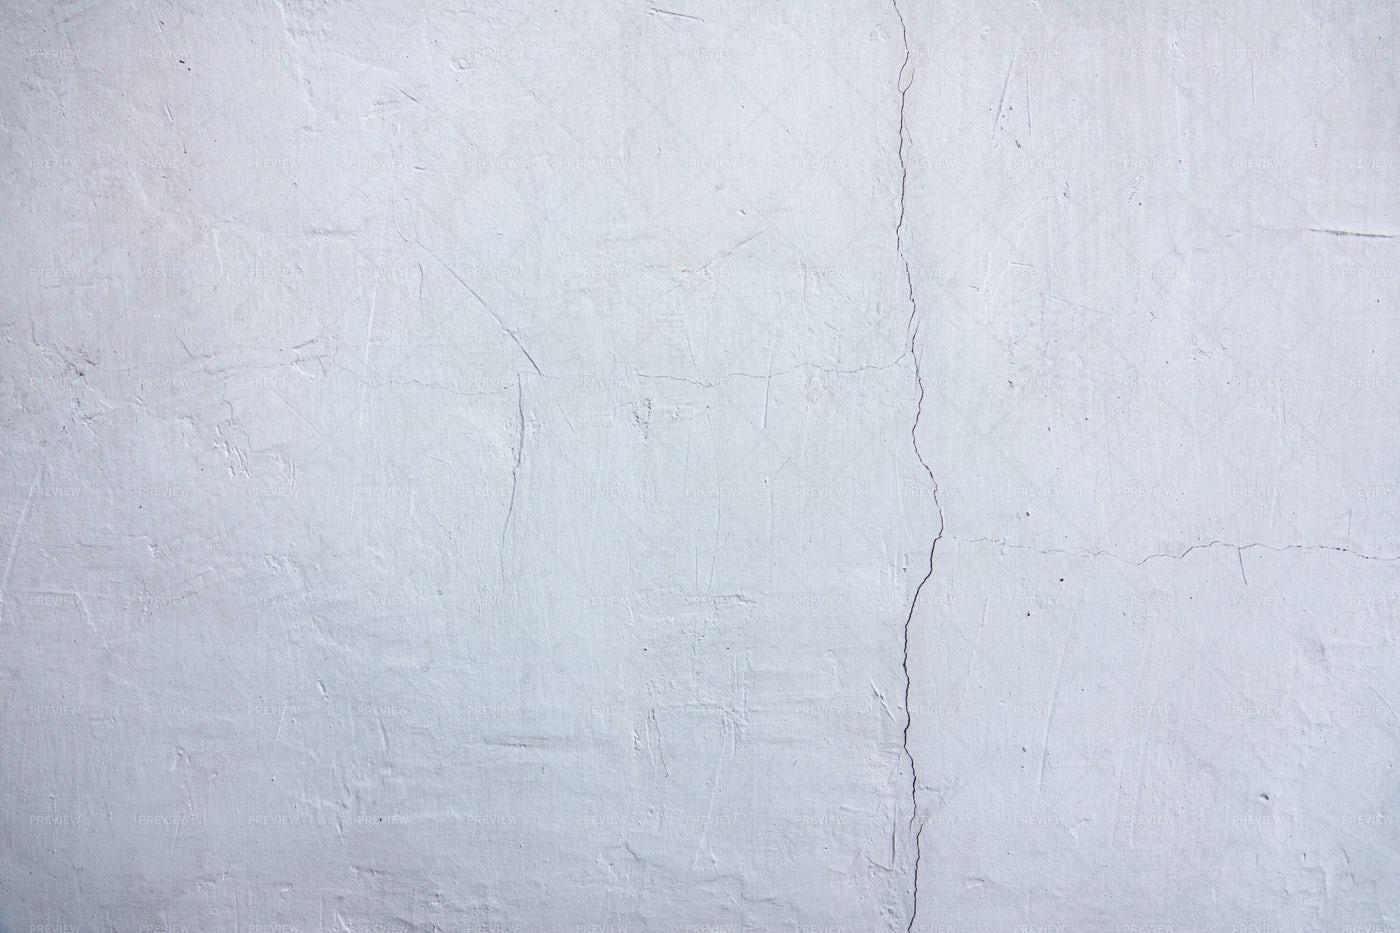 White Cracked Wall Texture: Stock Photos